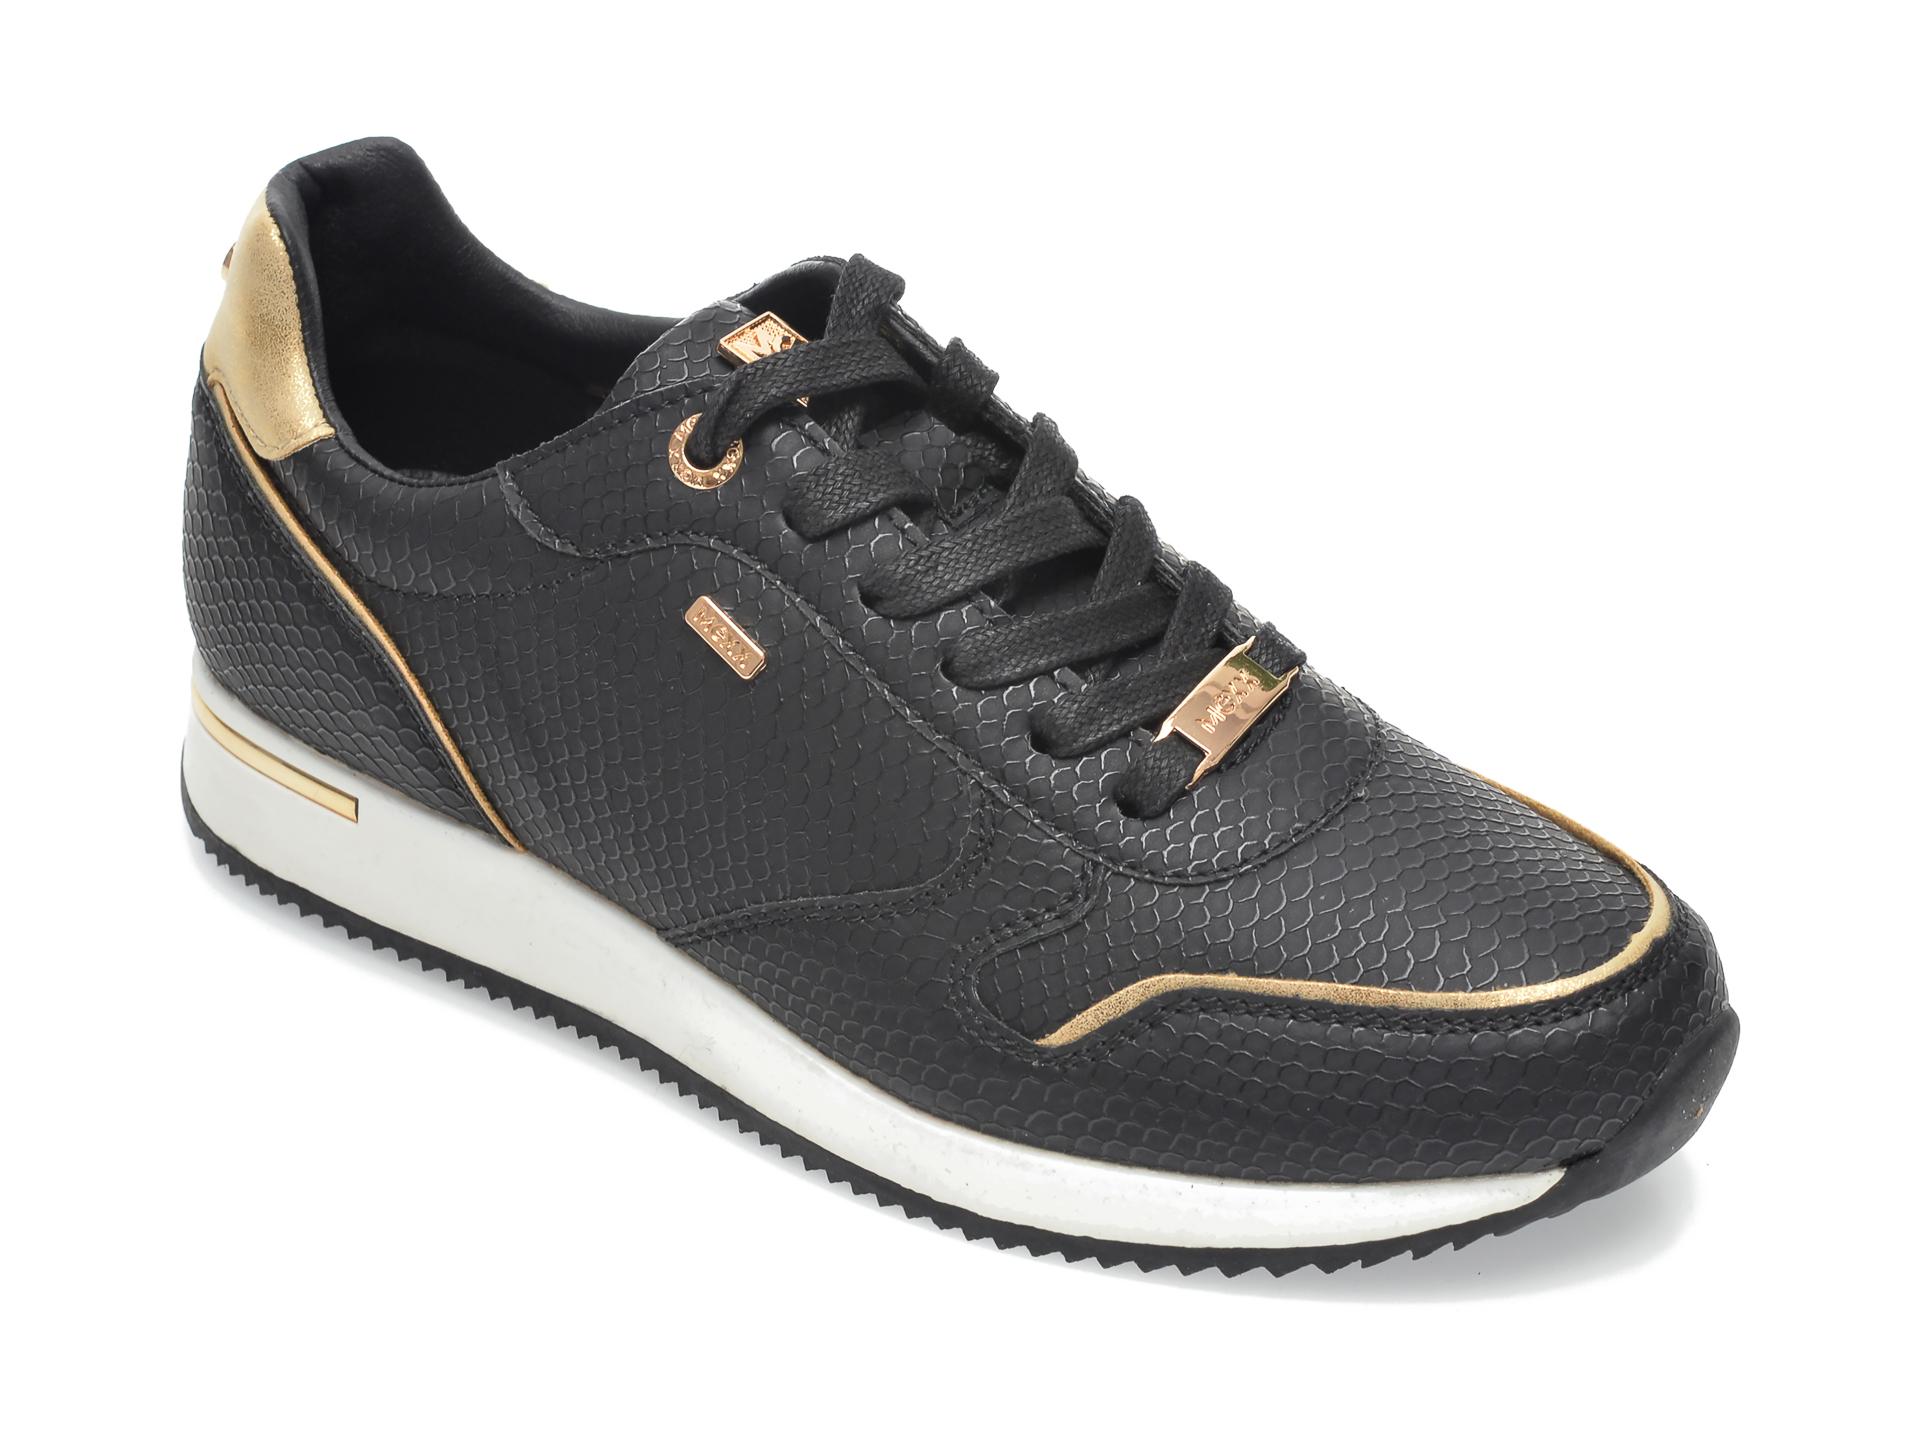 Pantofi sport MEXX negri, K0216, din piele ecologica